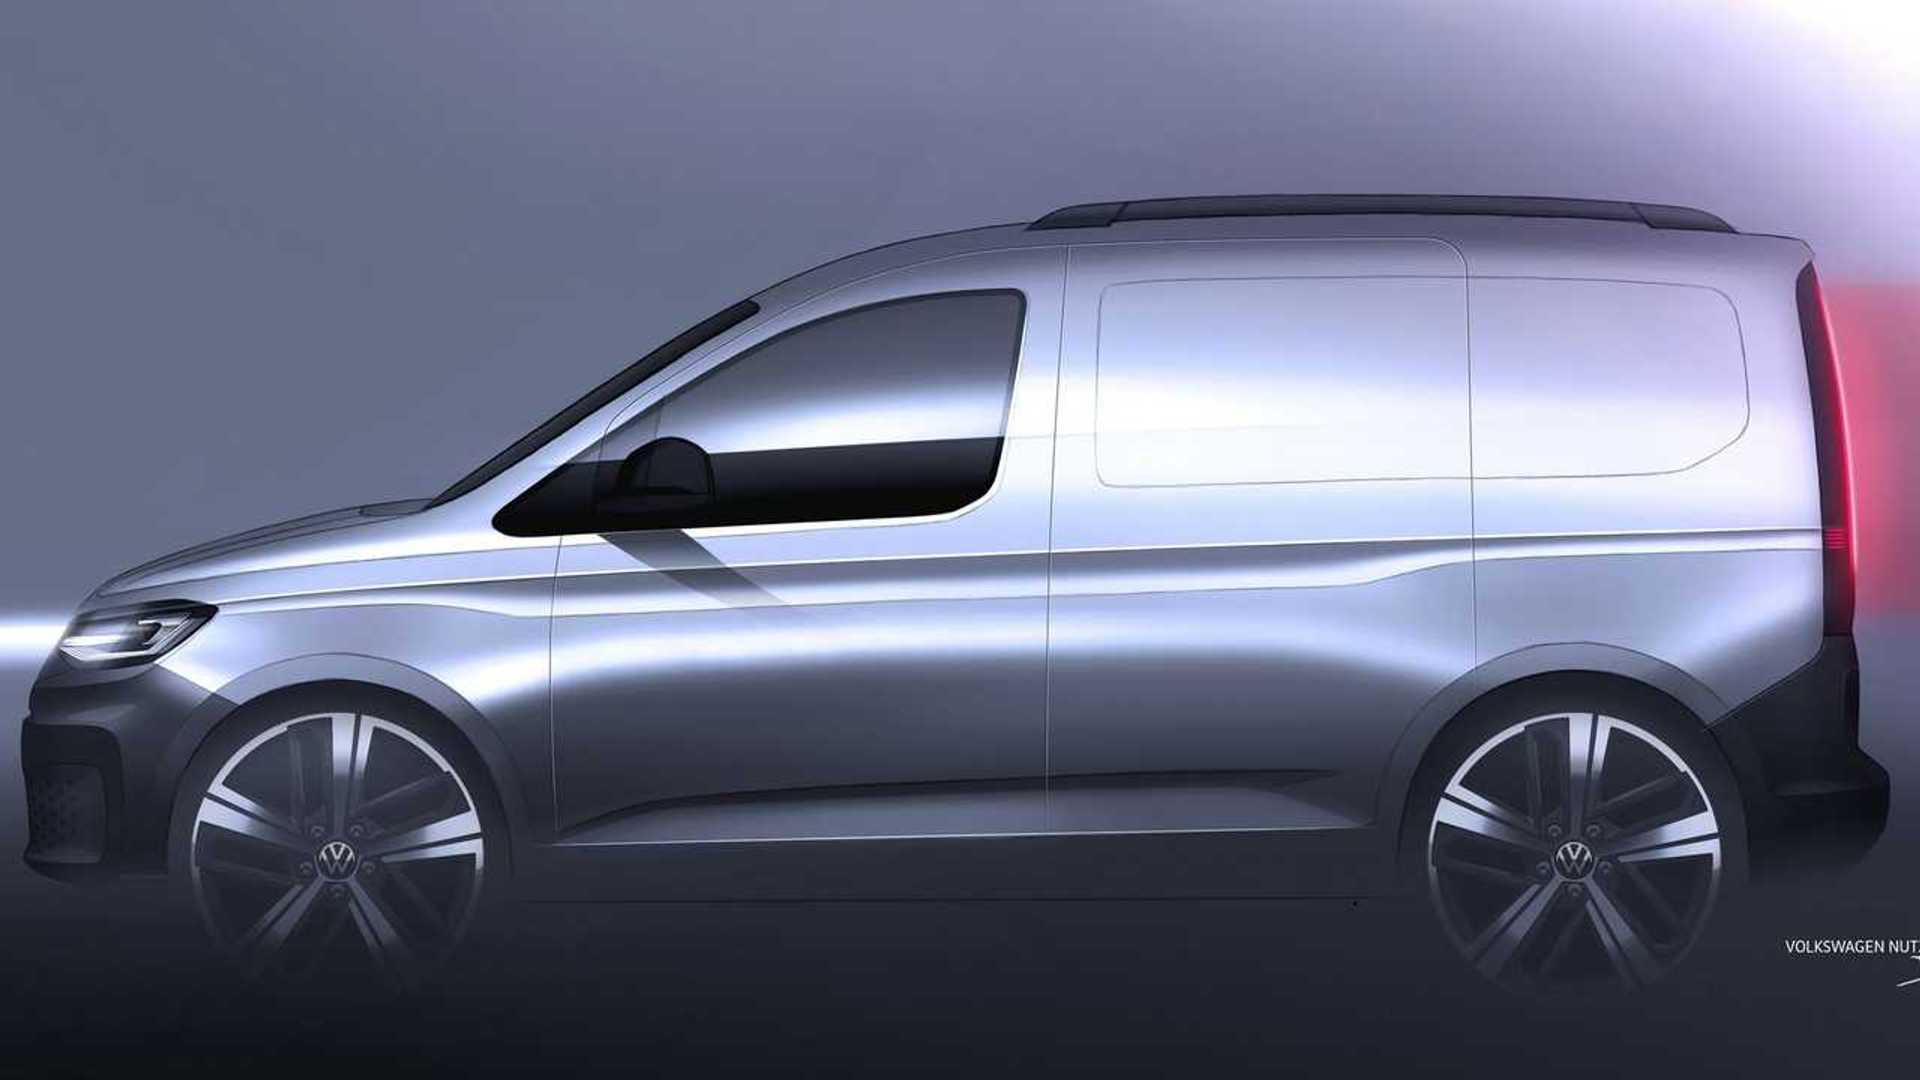 2020 Volkswagen Caddy Teaser Shows Off Stylish Little Van